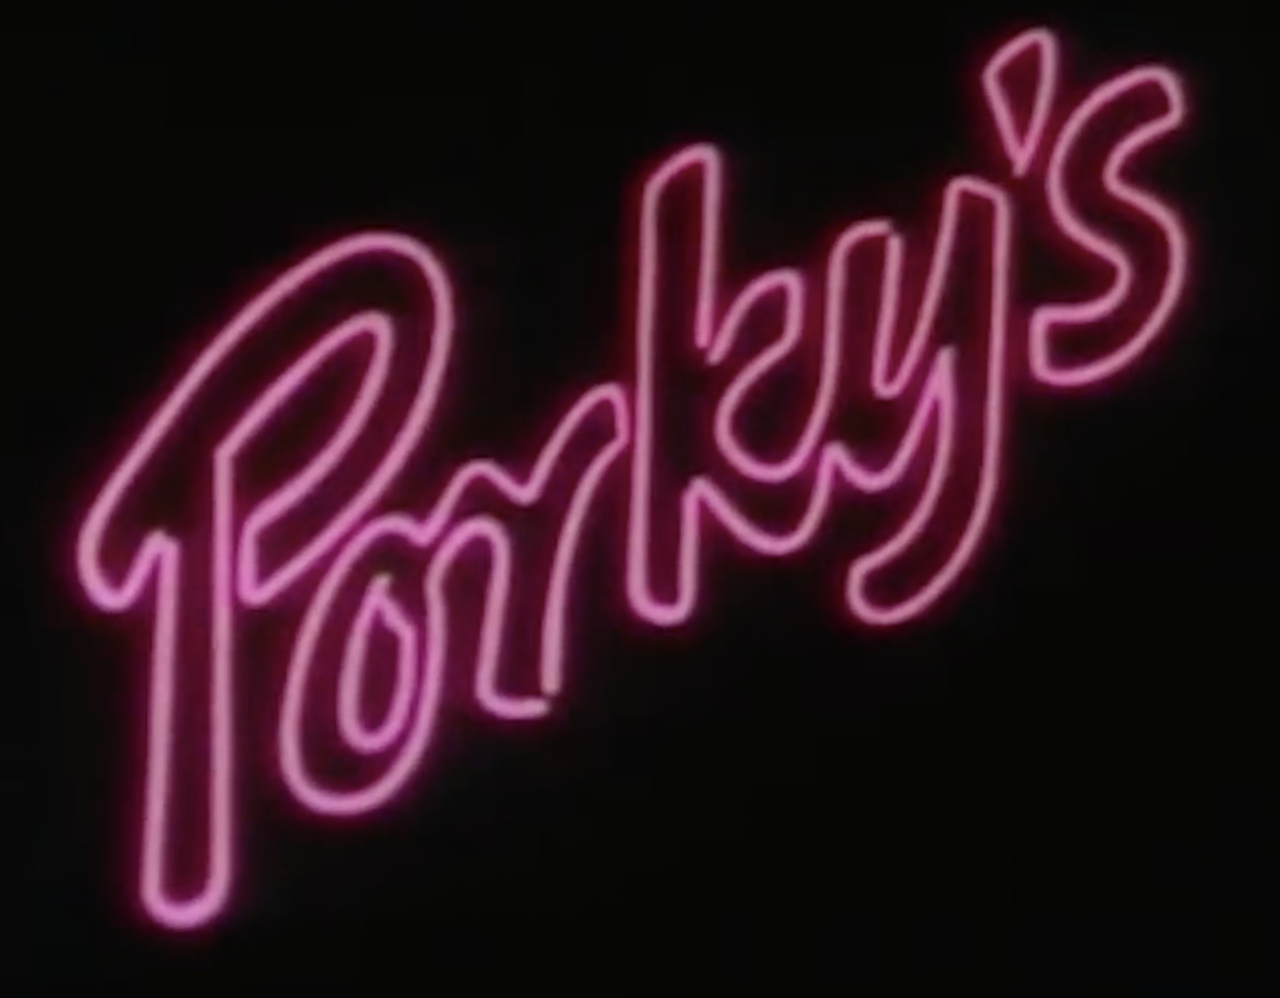 Porky's (Review)